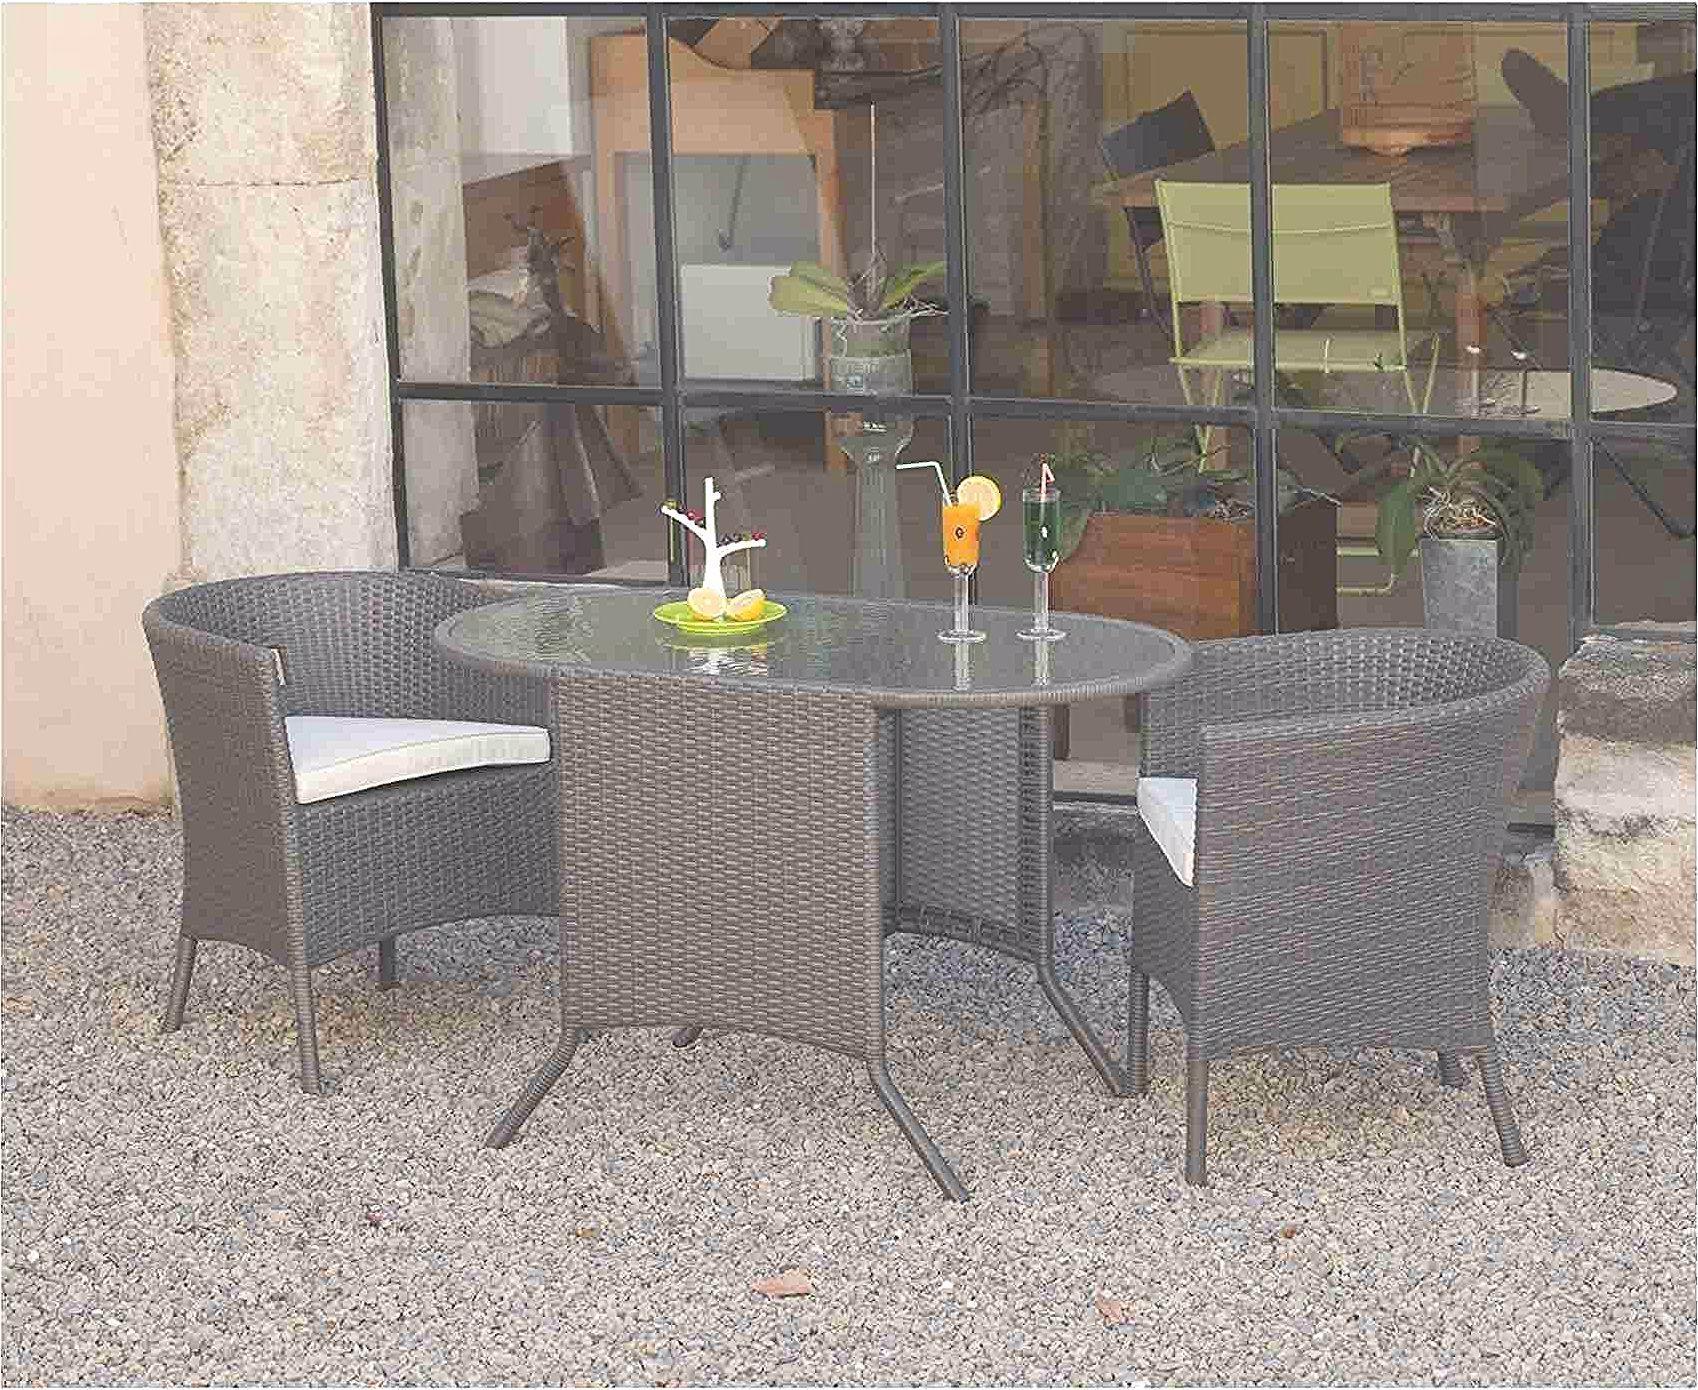 79 Glamorous Mobilier Jardin Leclerc | Outdoor Furniture ... à Salon De Jardin Leclerc Catalogue